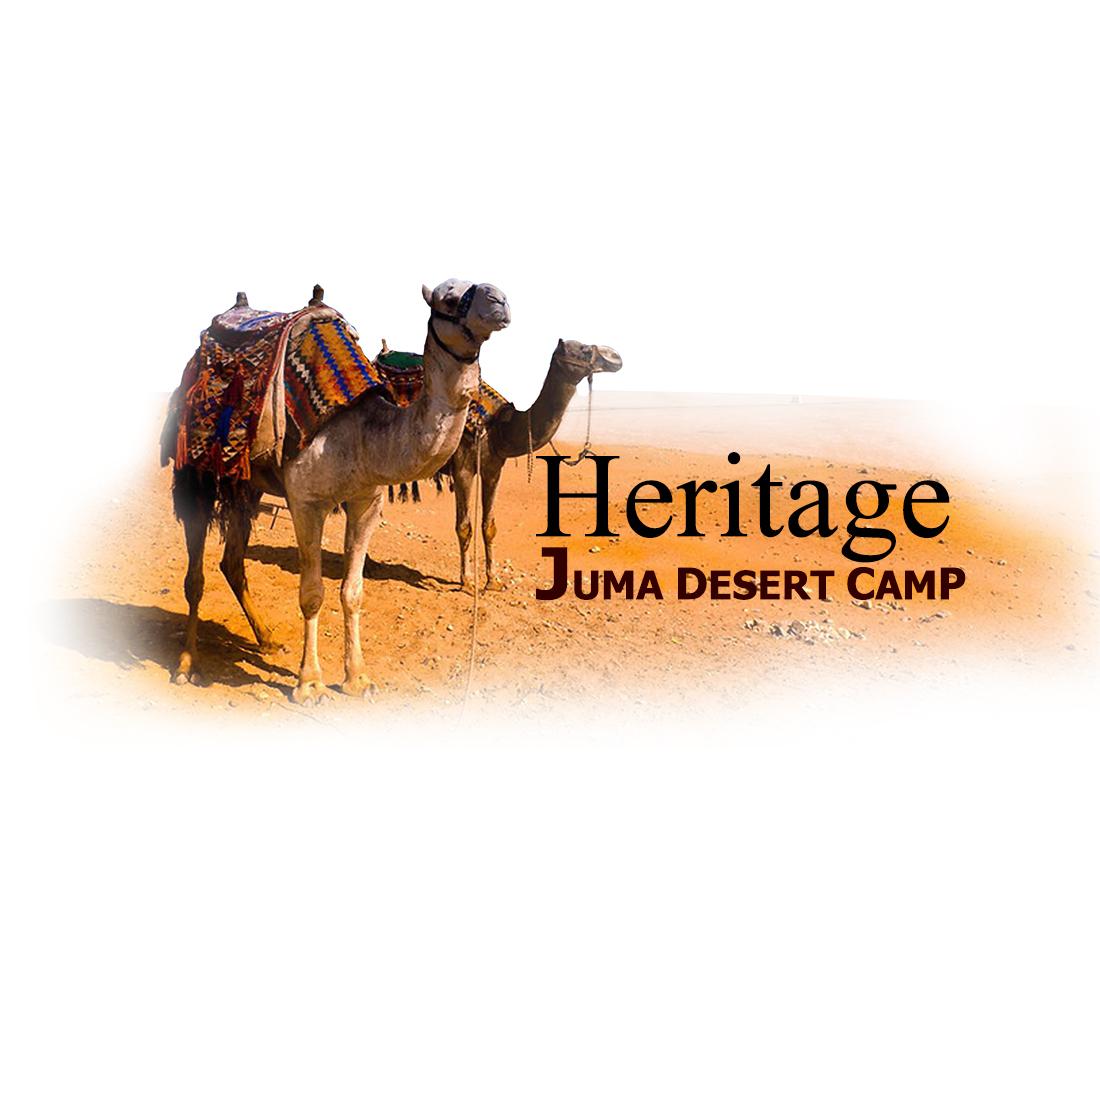 Heritage Juma Desert Camp